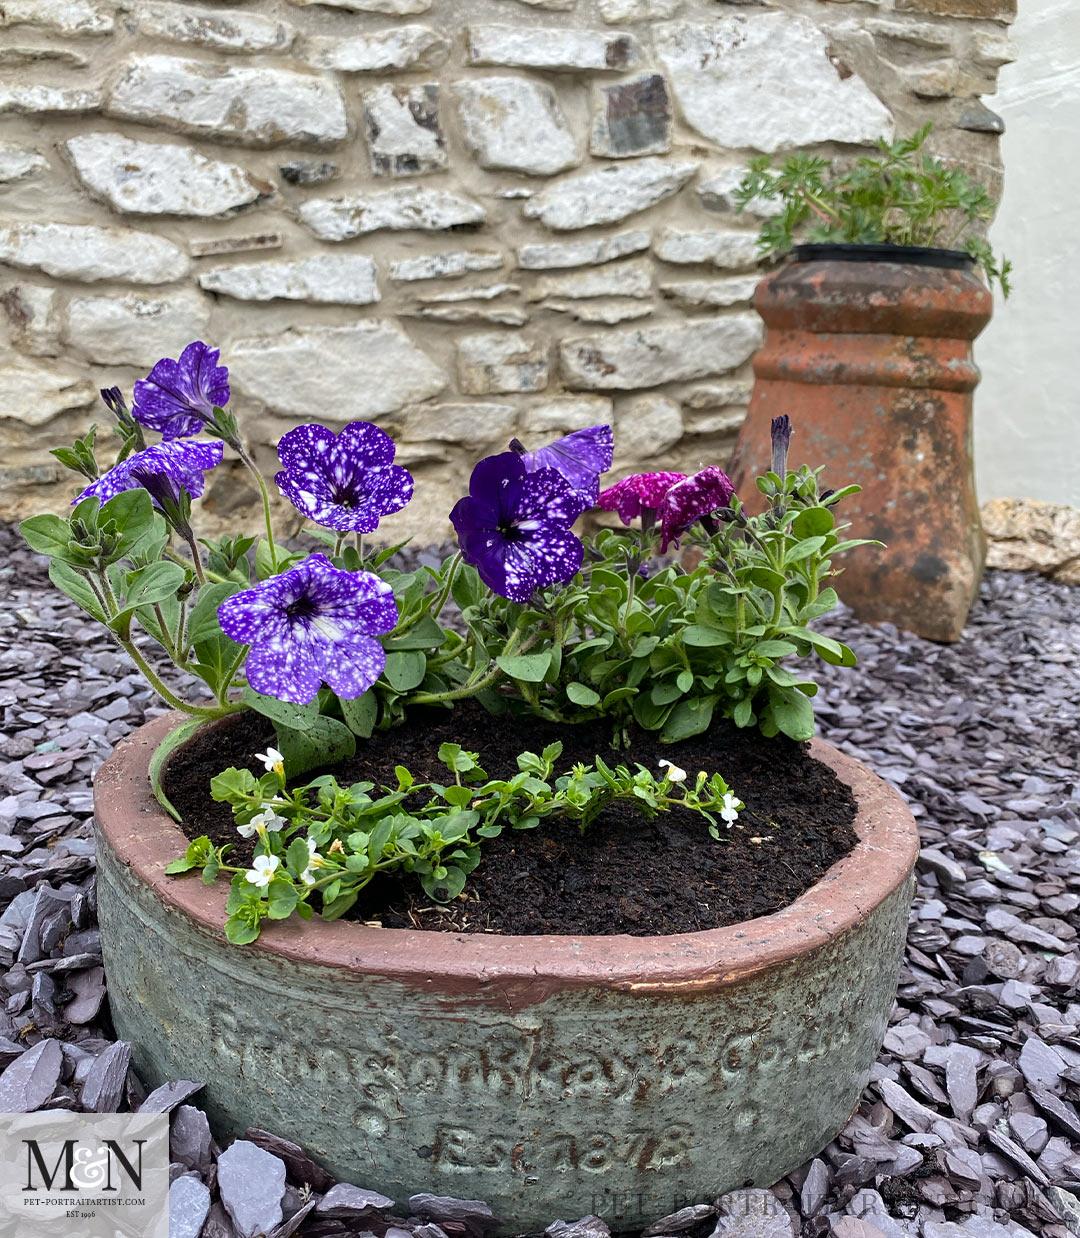 blue hardy geranium and petunias